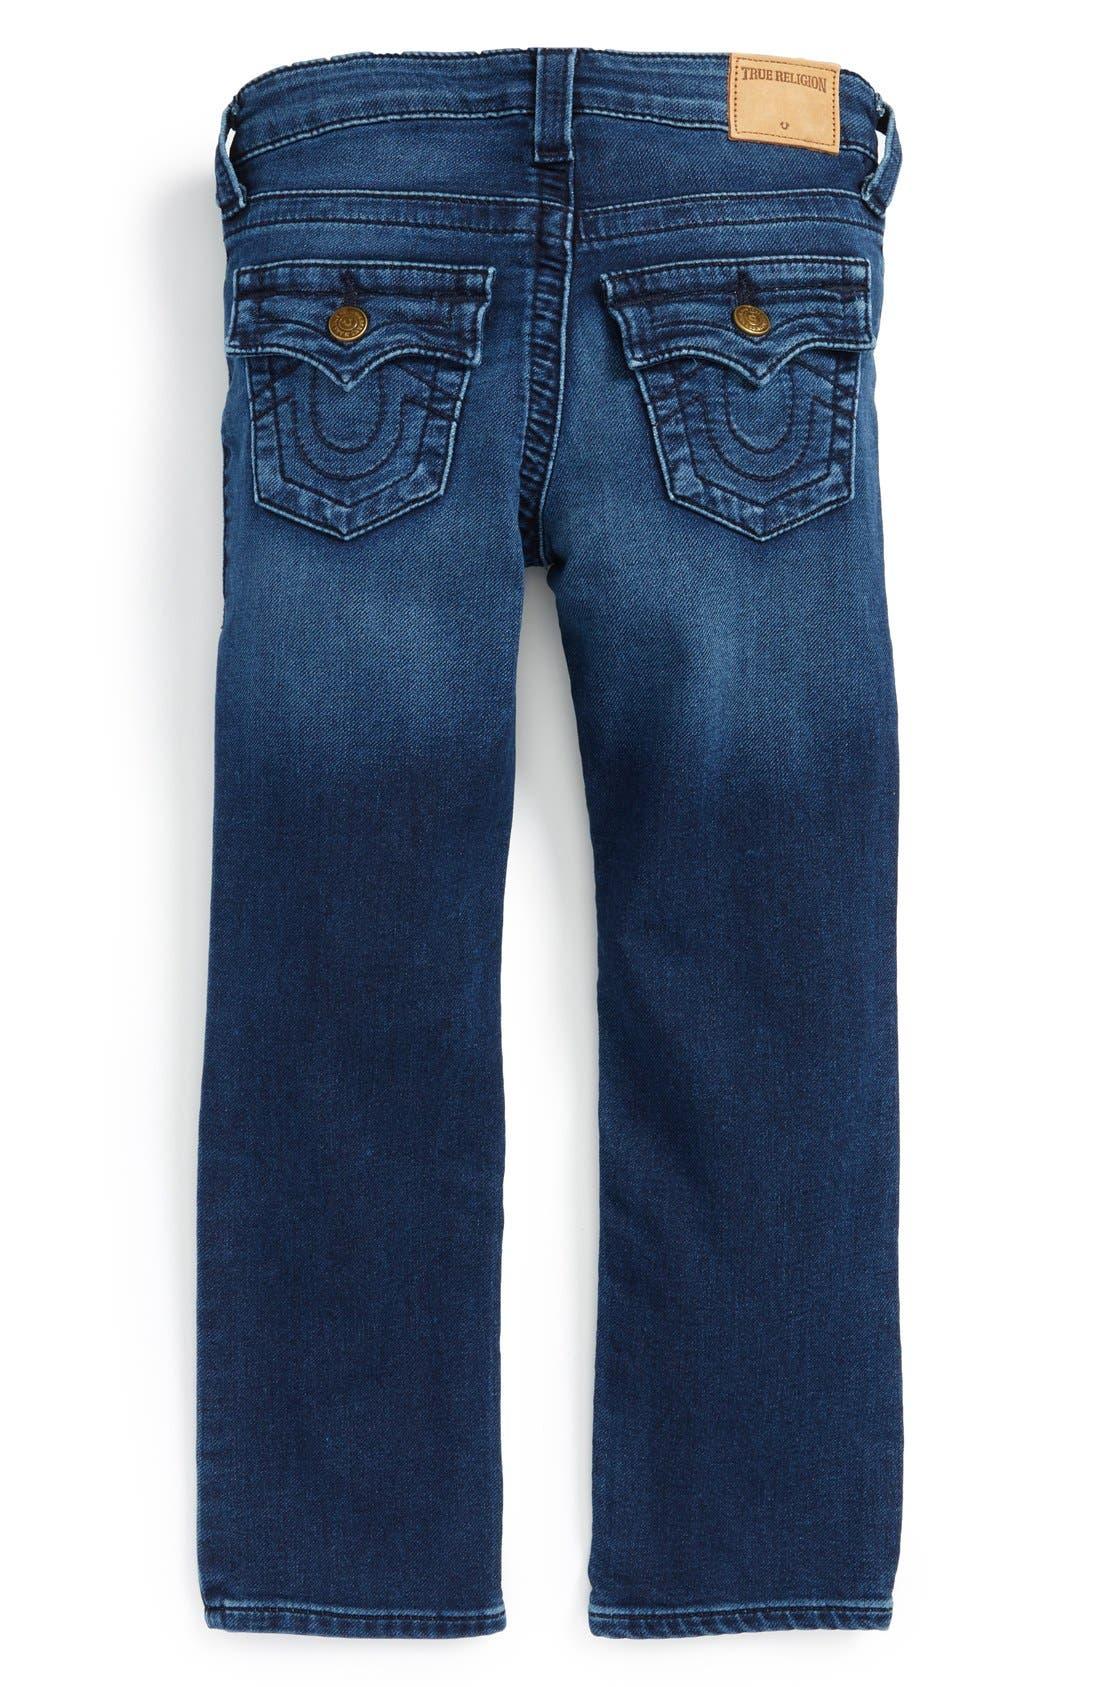 Alternate Image 2  - True Religion Brand Jeans 'Knit Sweatpant' Jeans (Toddler Boys & Little Boys)